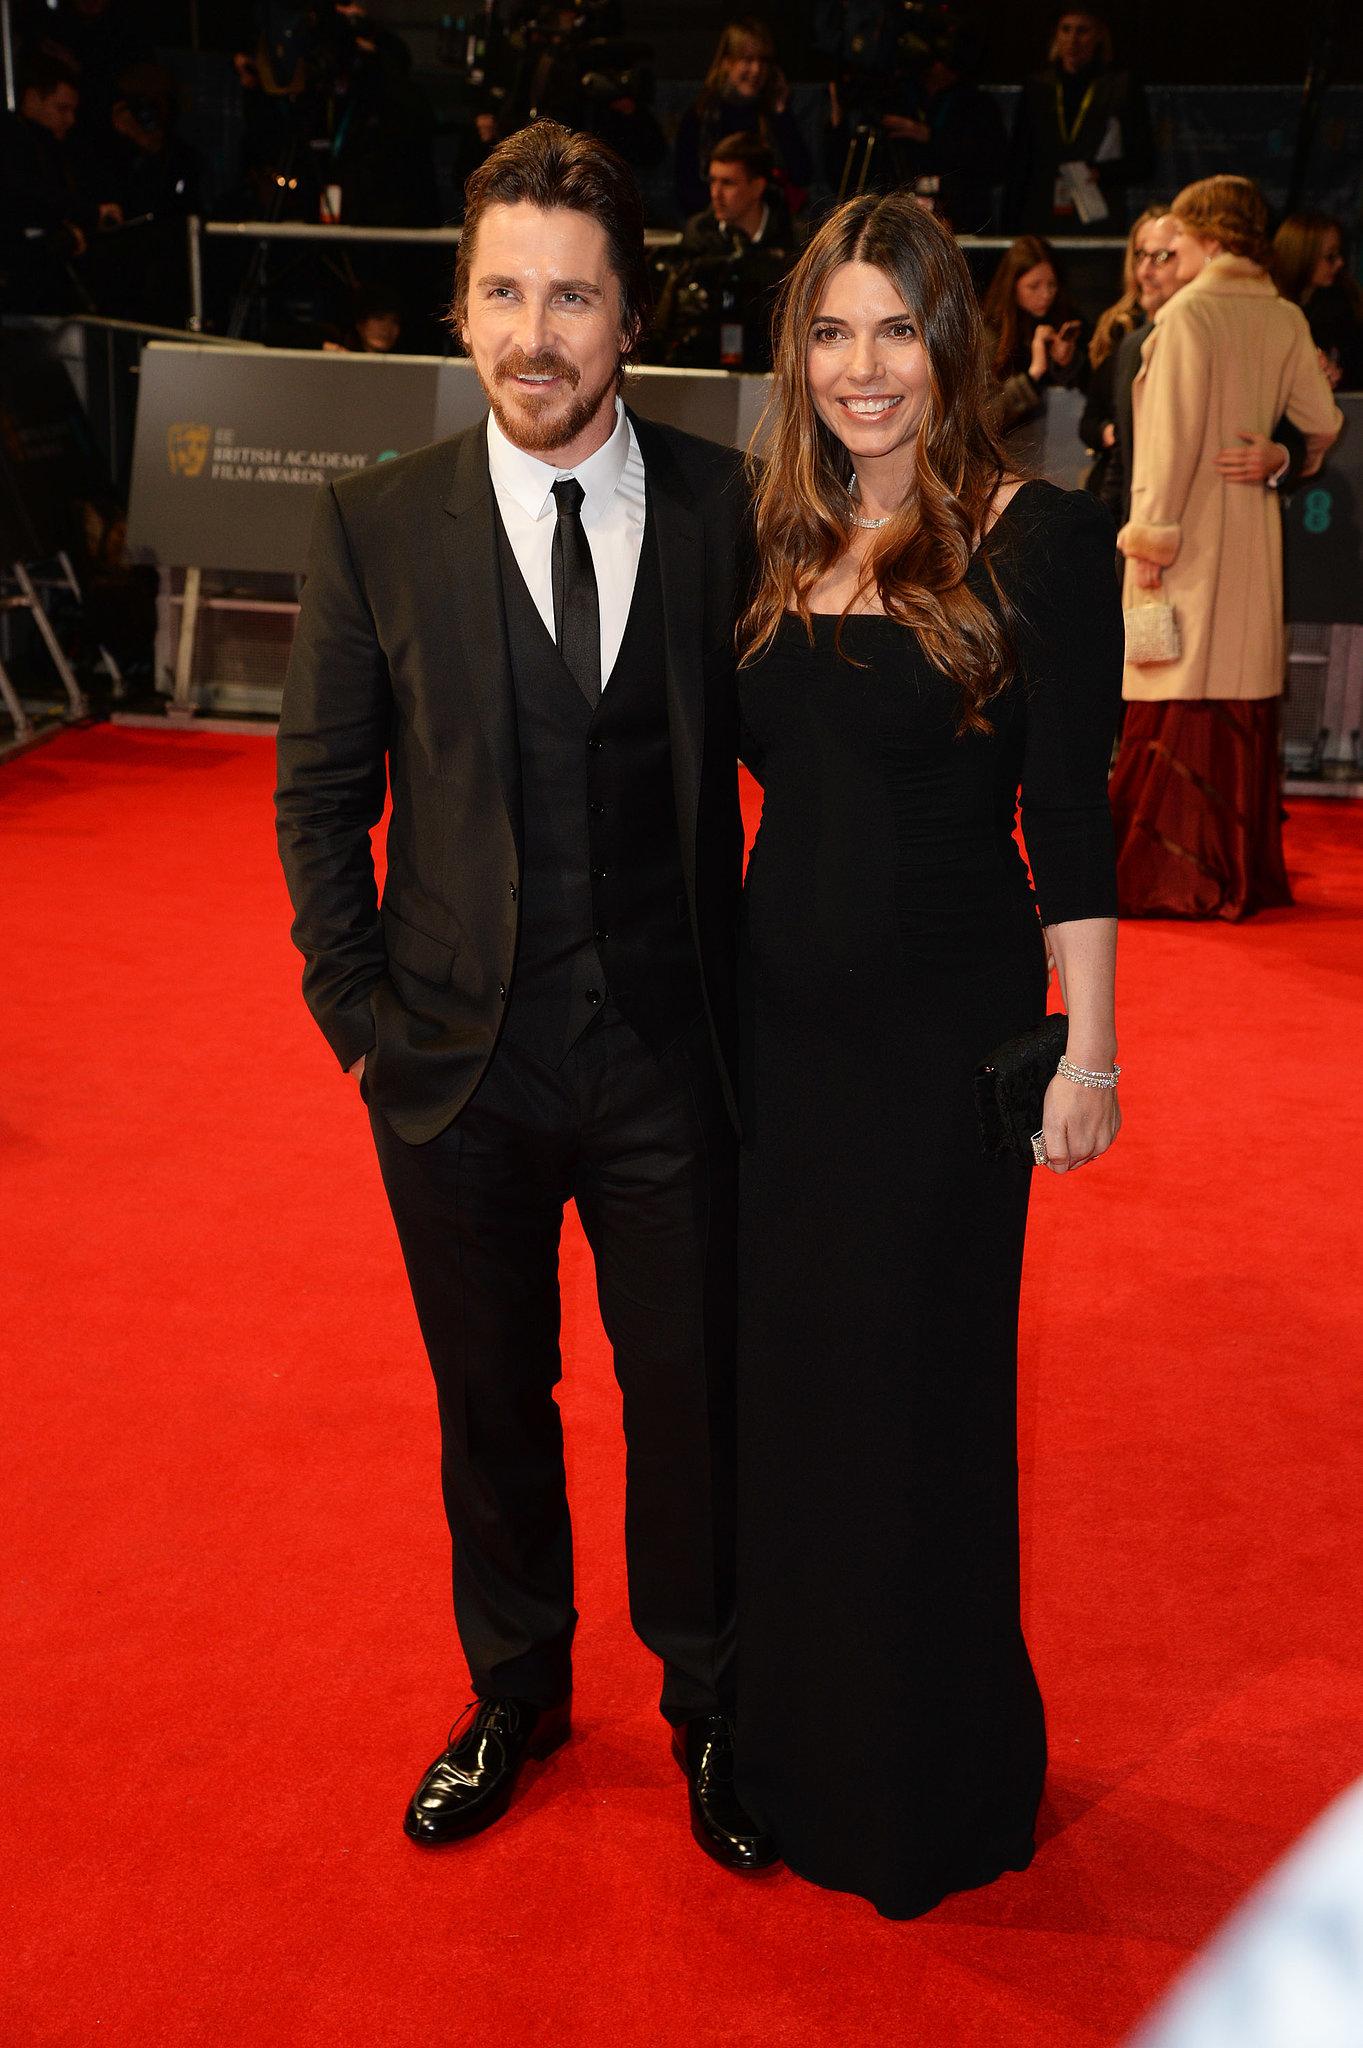 Christian Bale and Sibi Blazic at the 2014 BAFTA Awards.